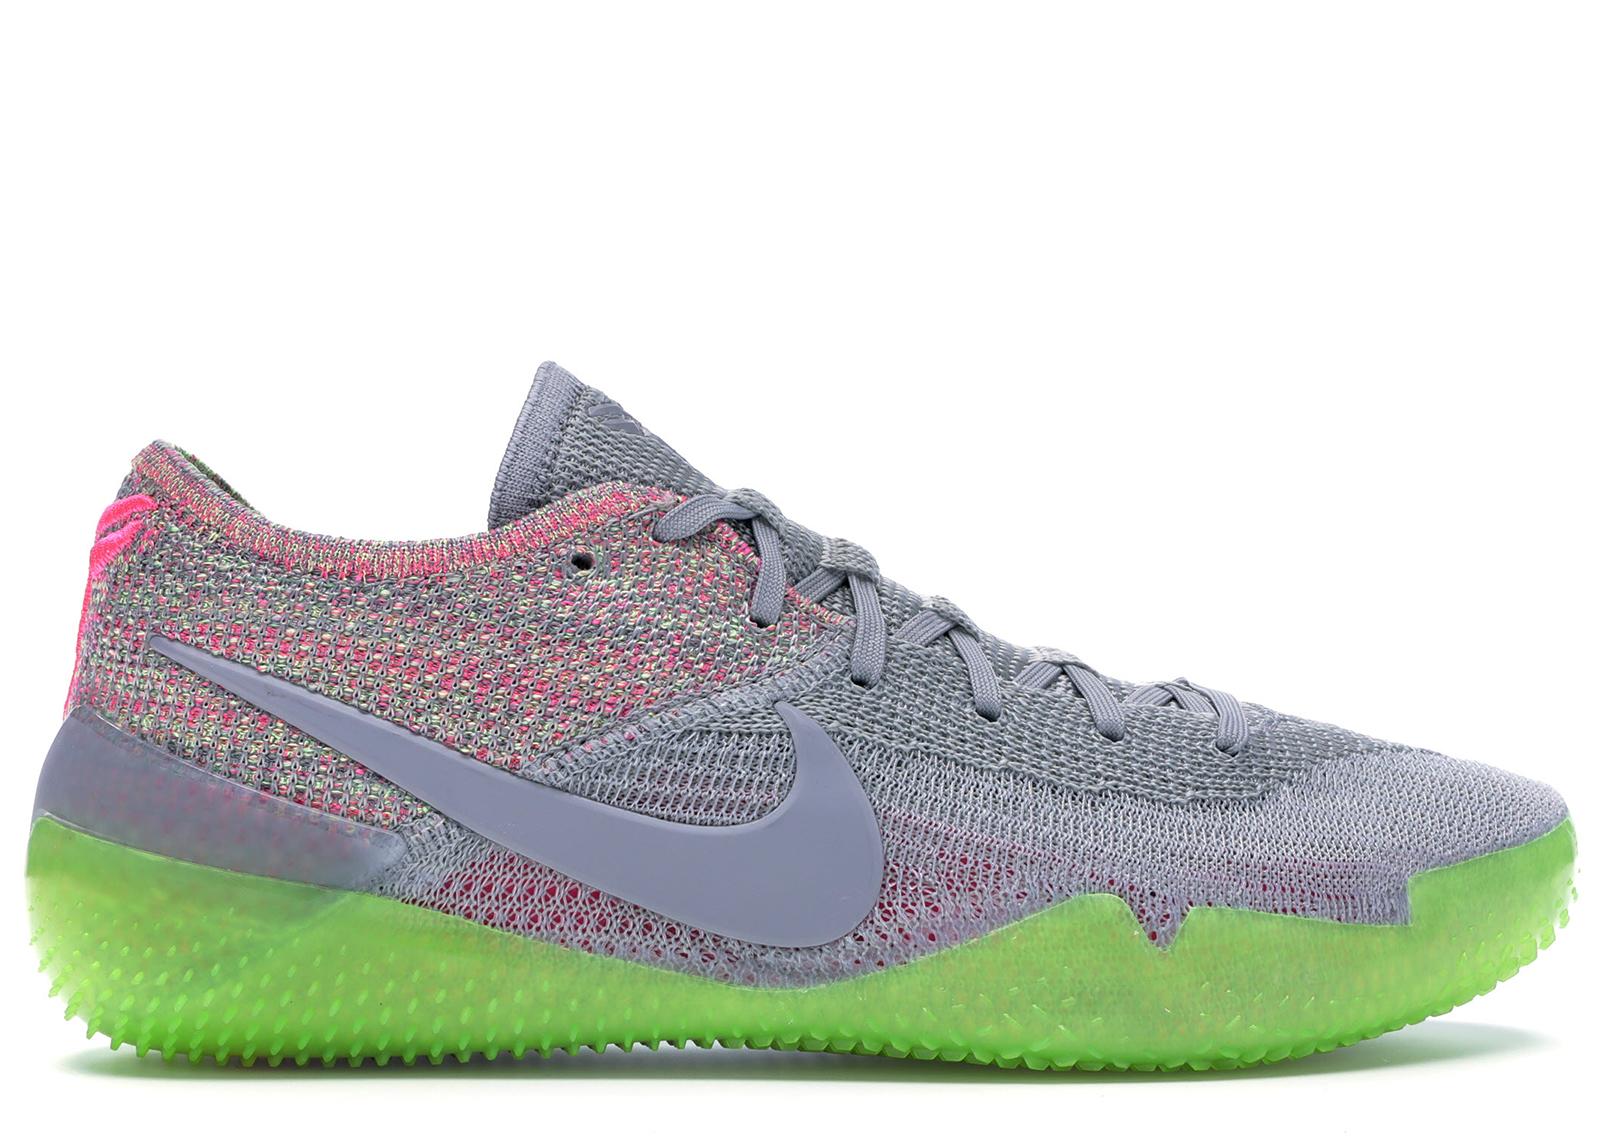 Nike Kobe NXT 360 Multi-Color - AQ1087-003